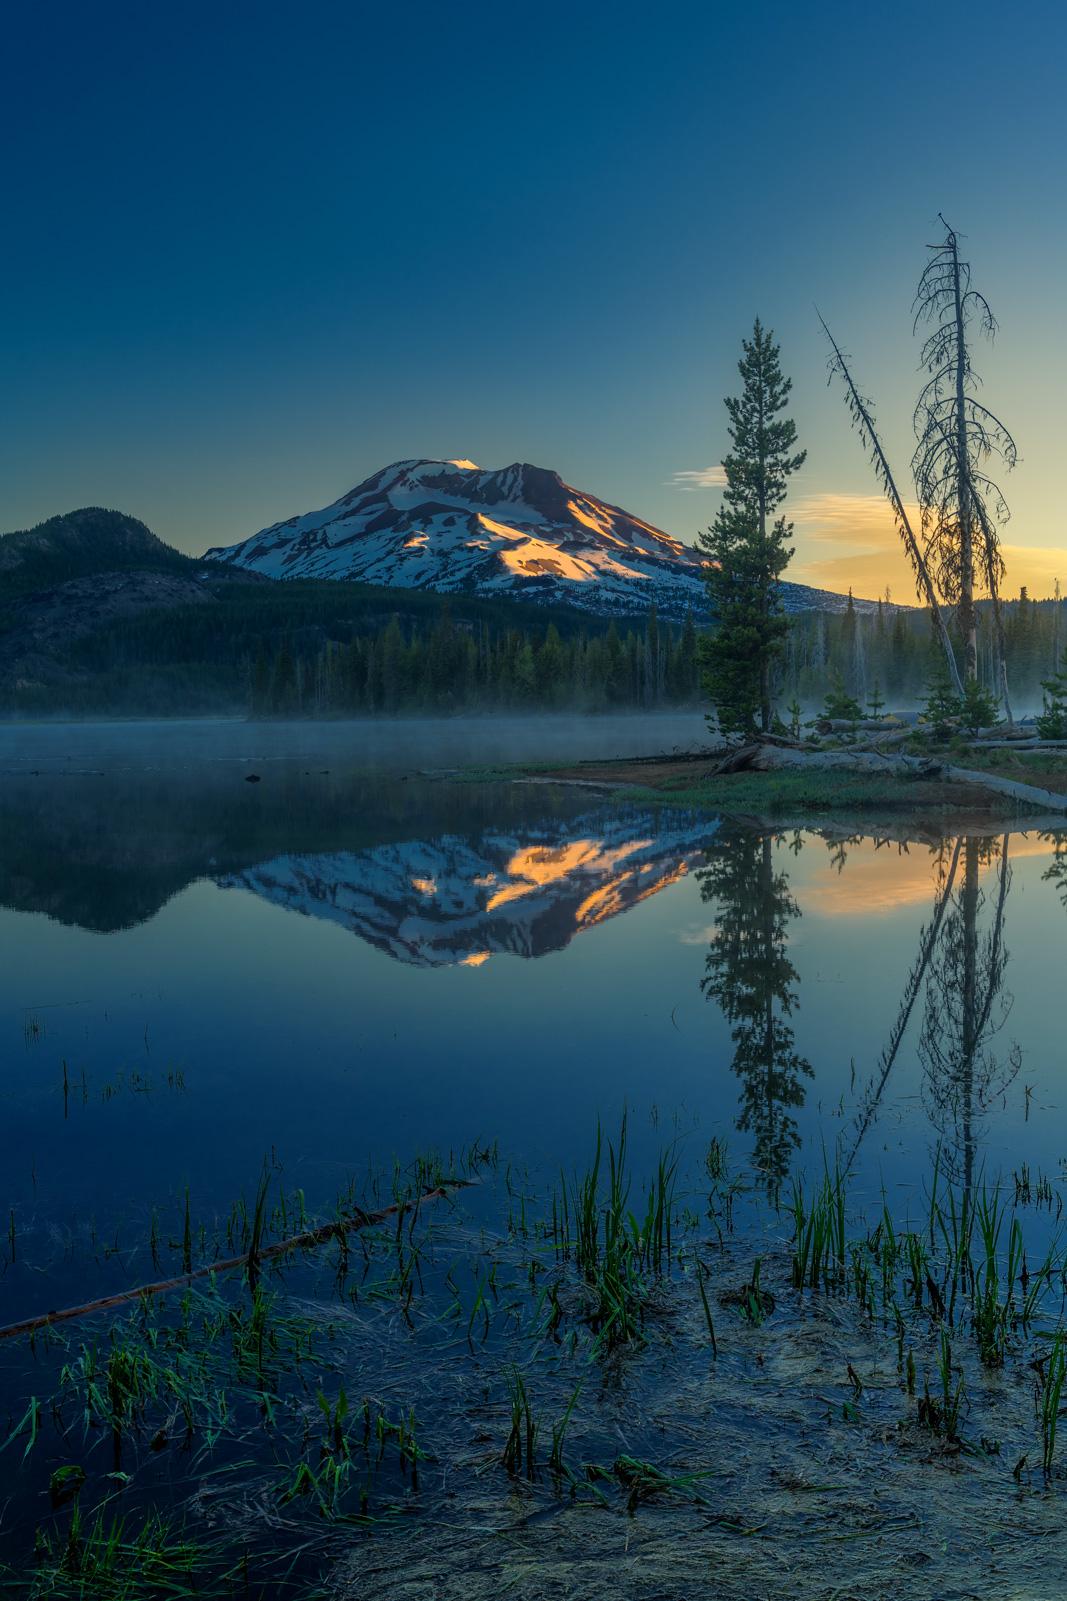 Oregon, Sparks, Lake, Sunrise, limited edition, photograph, fine art, landscape, photo